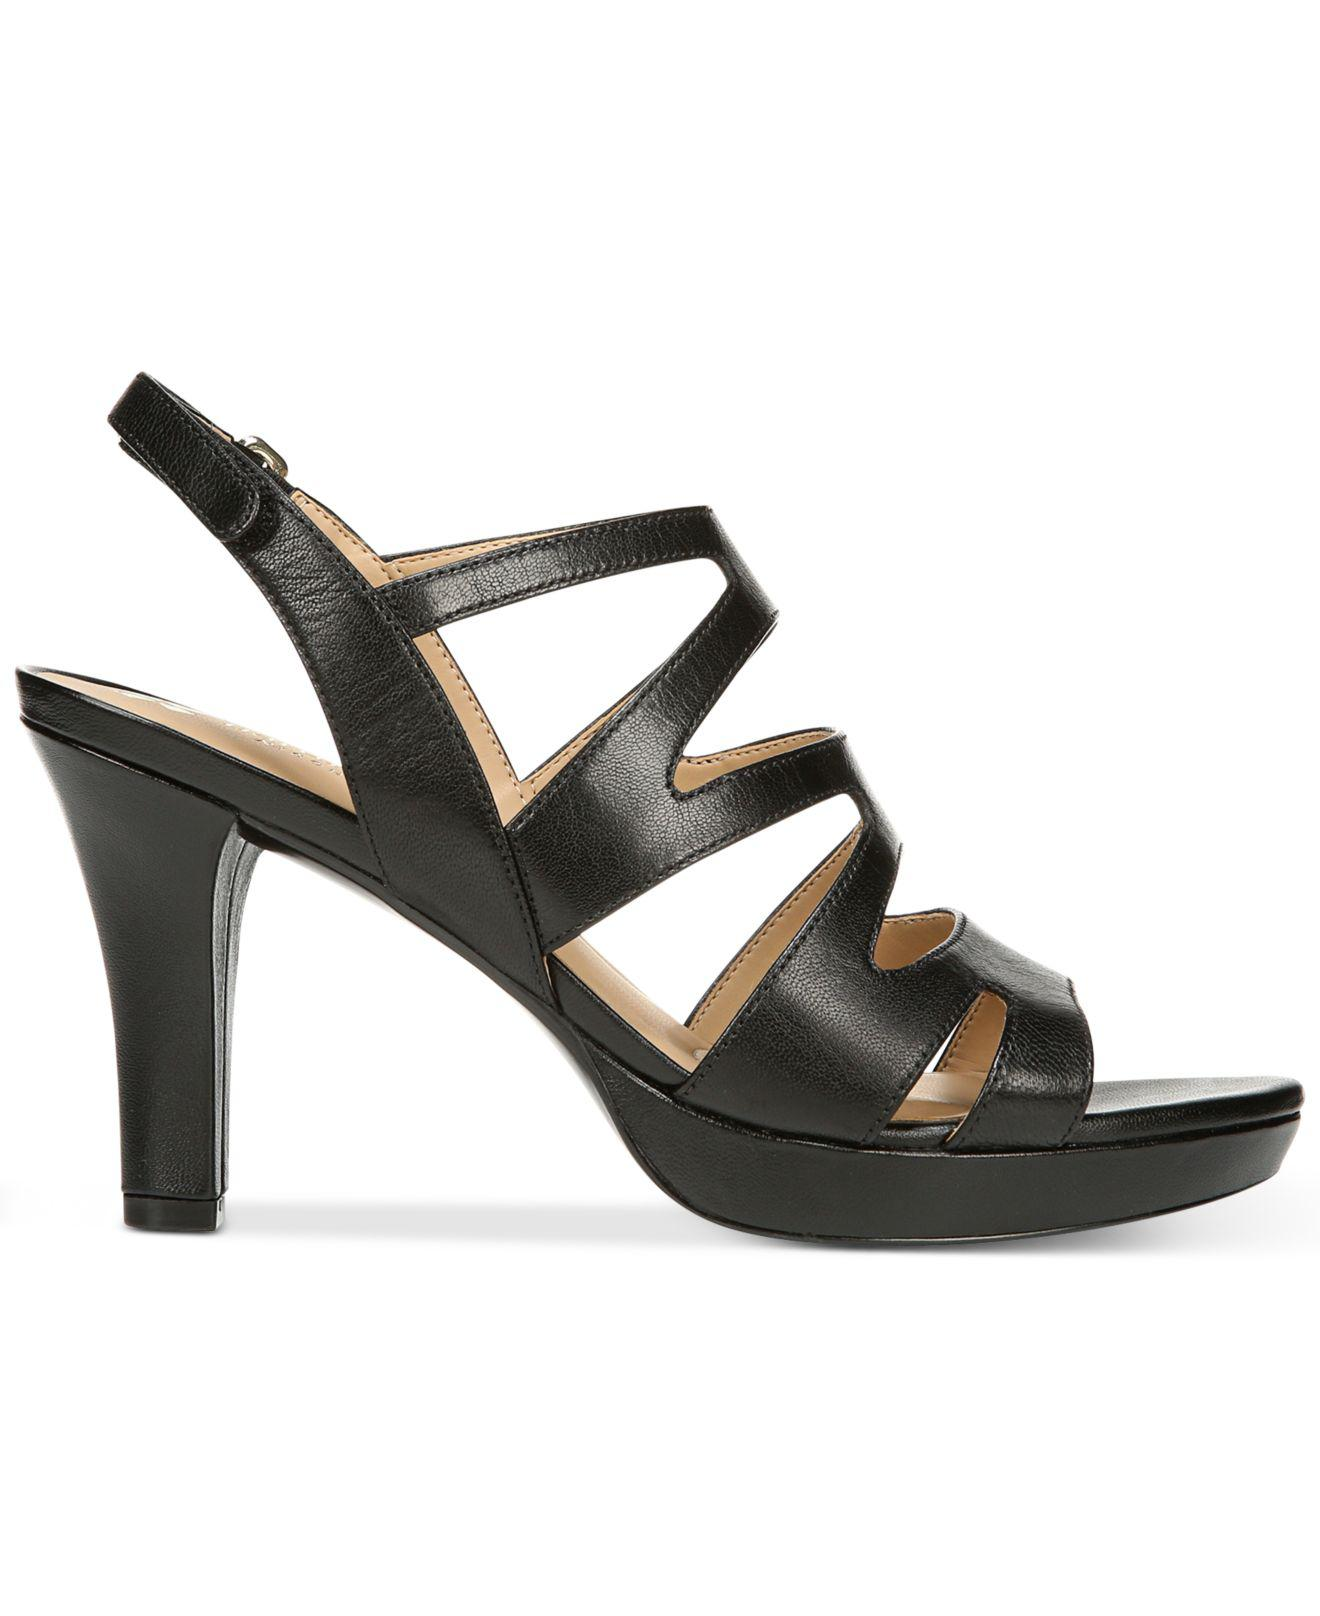 a9d0e9aa603 Lyst - Naturalizer Pressley Sandals in Black